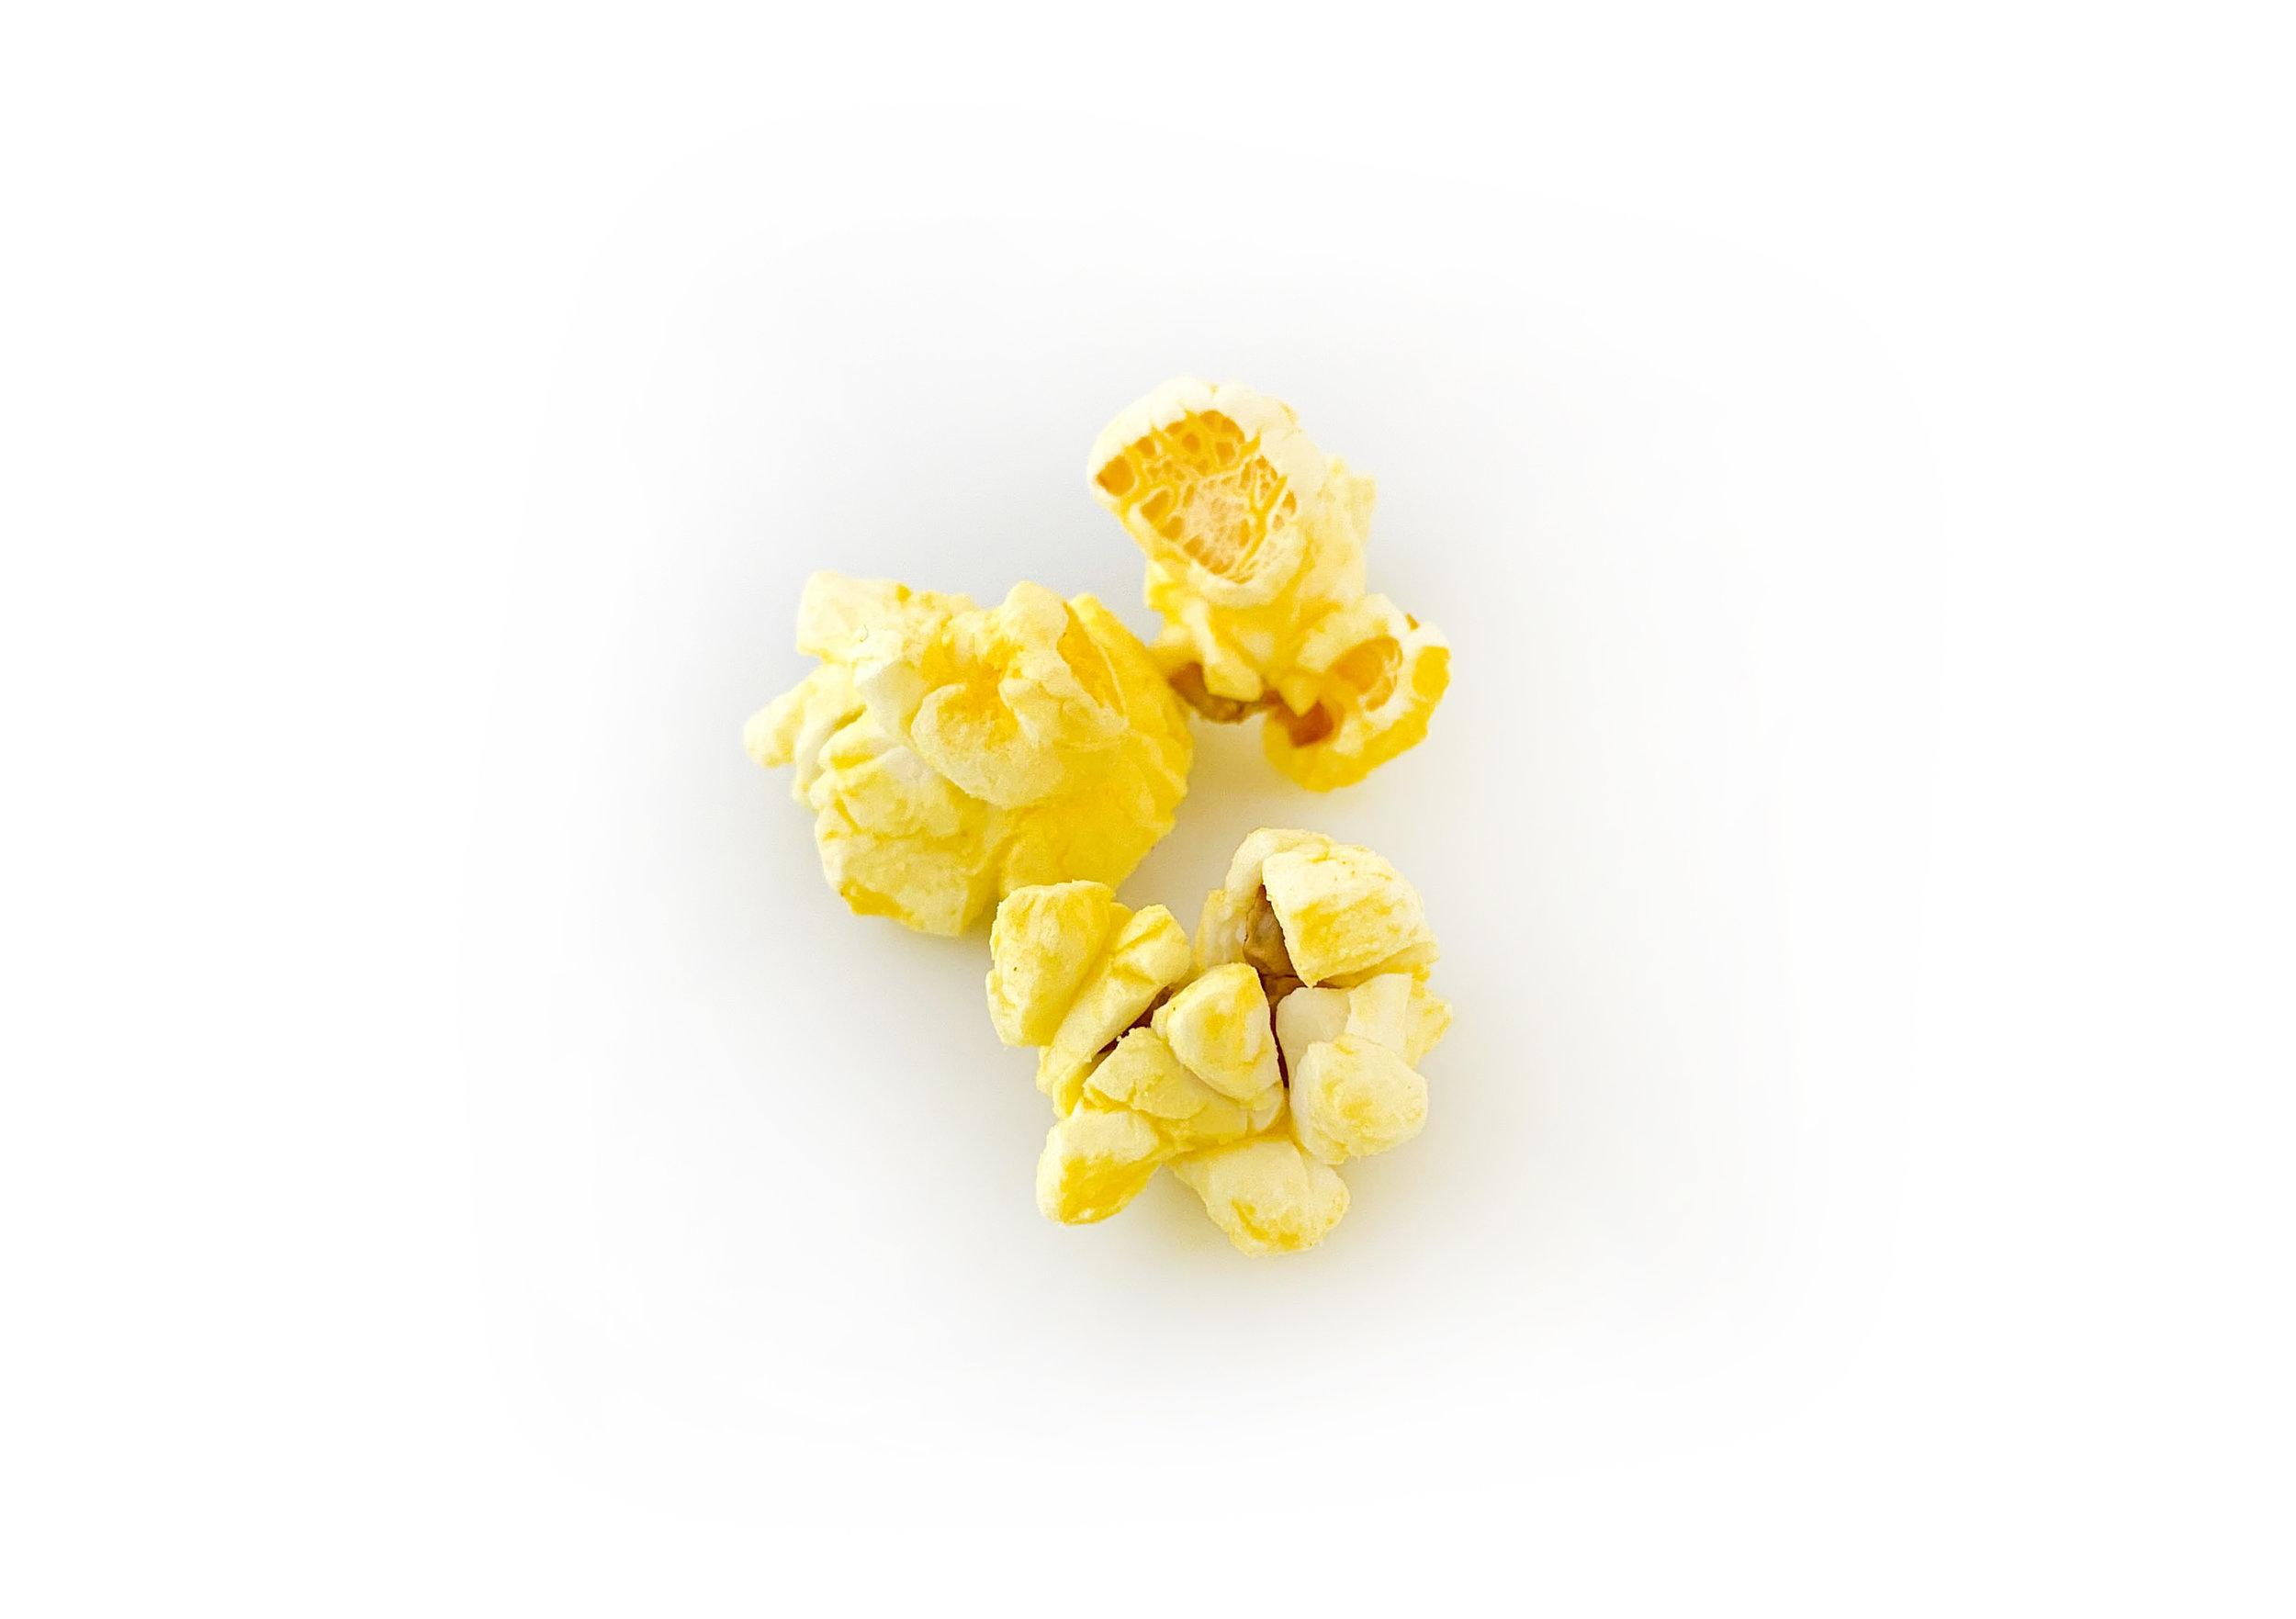 Movie Time - Classic movie theater popcorn taste.